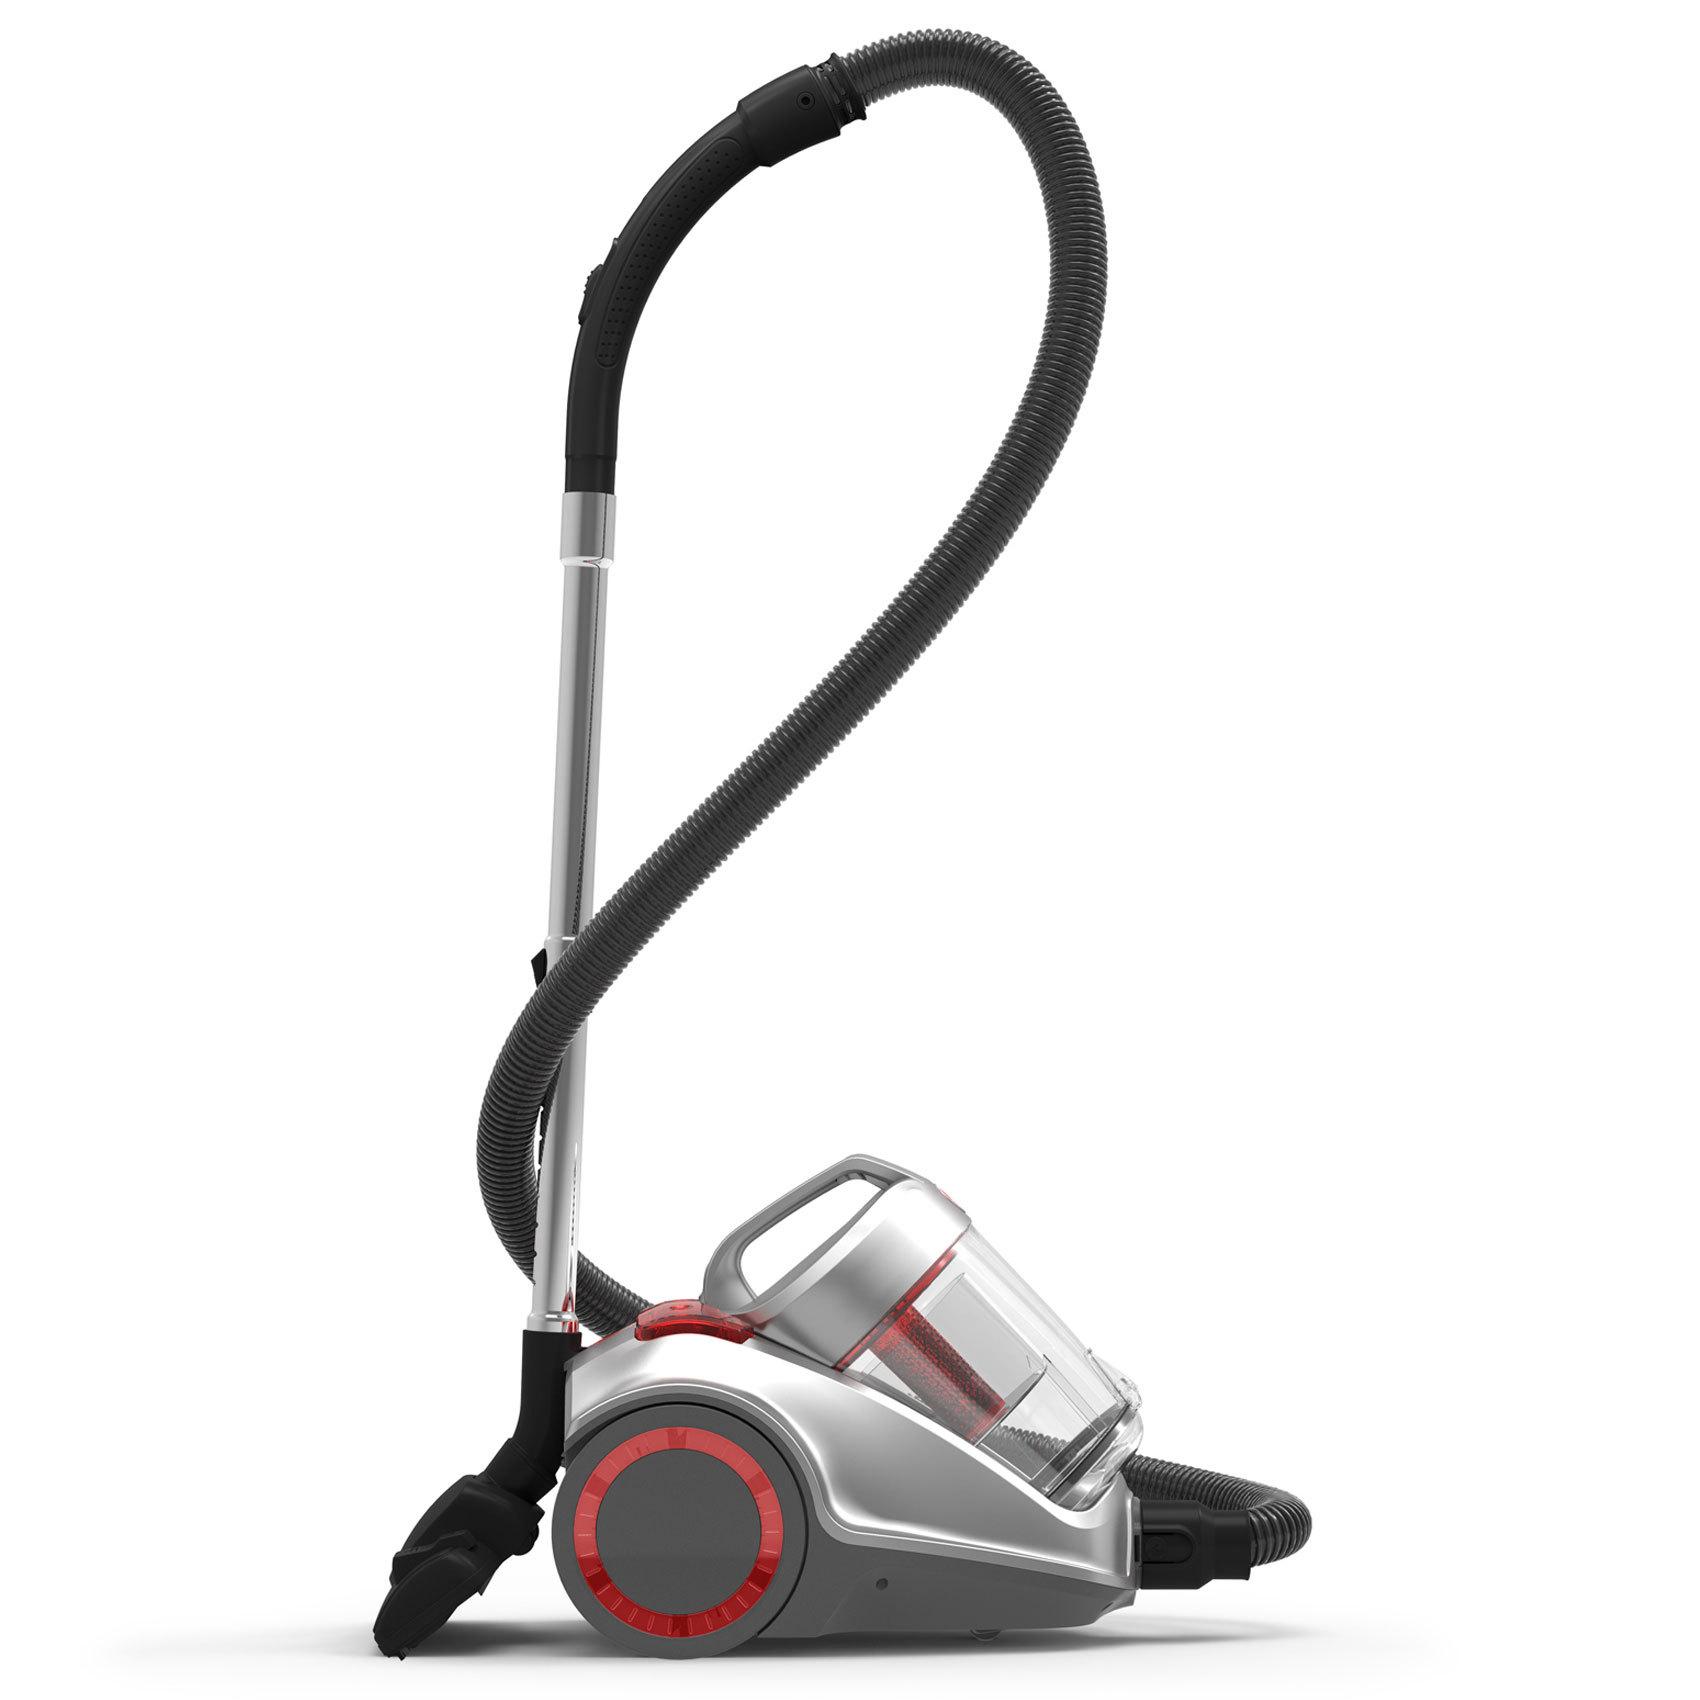 HOOVER V-CLEANER DRY HC84-P6A-ME